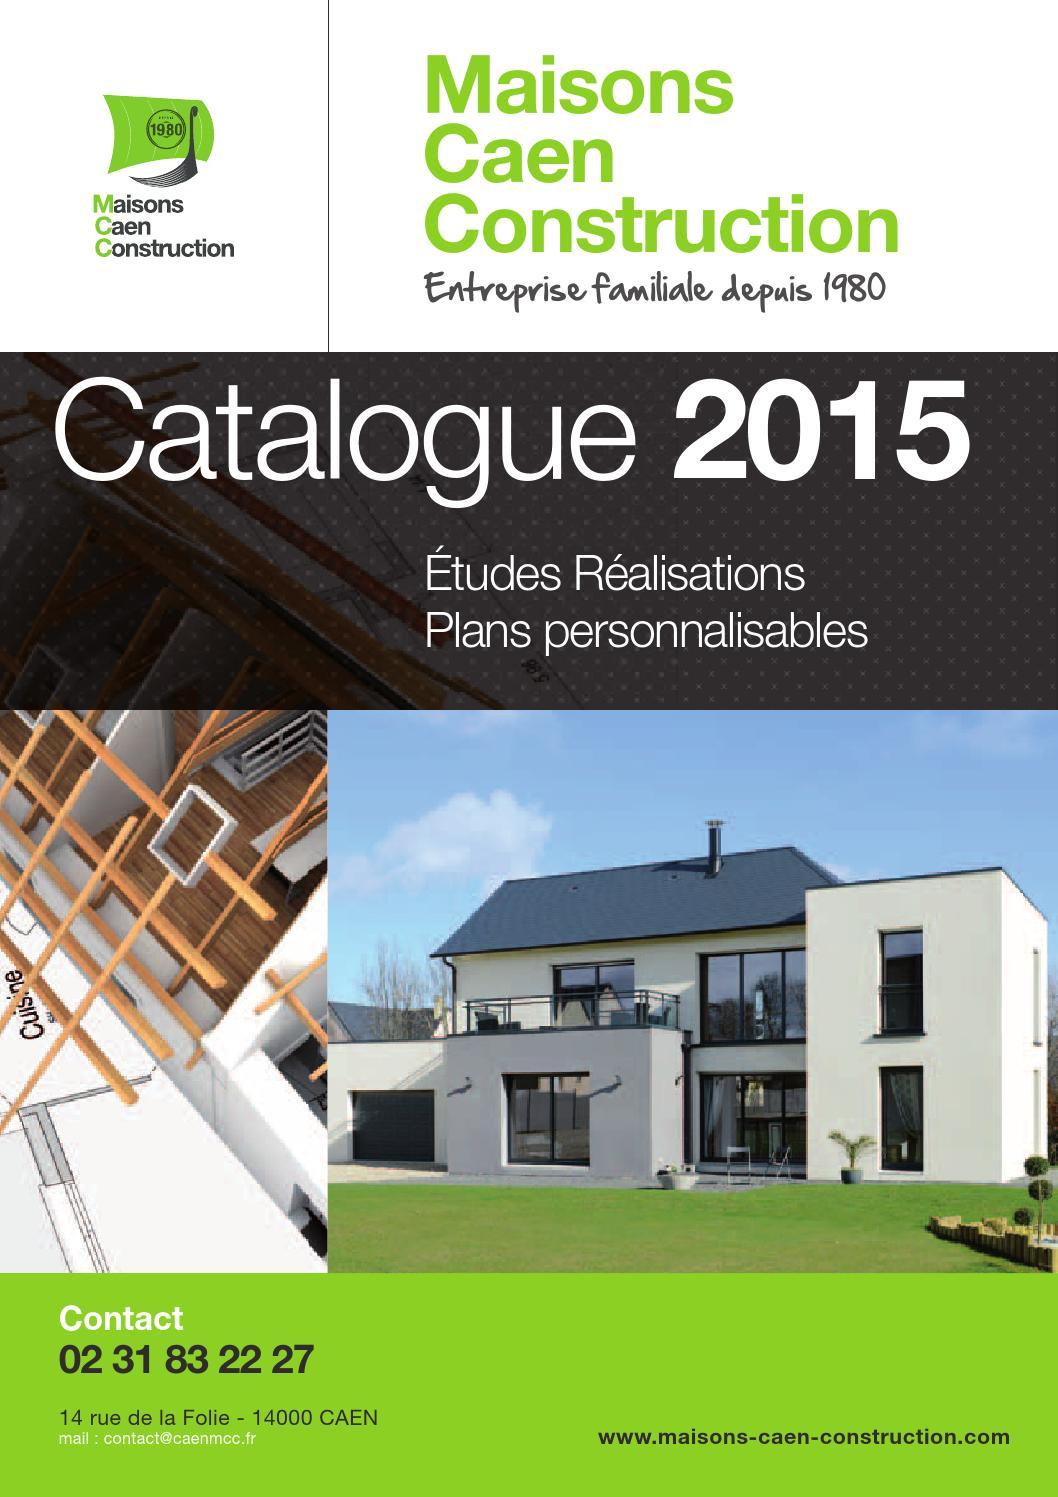 Maison caen construction forum ventana blog for Catalogue construction maison